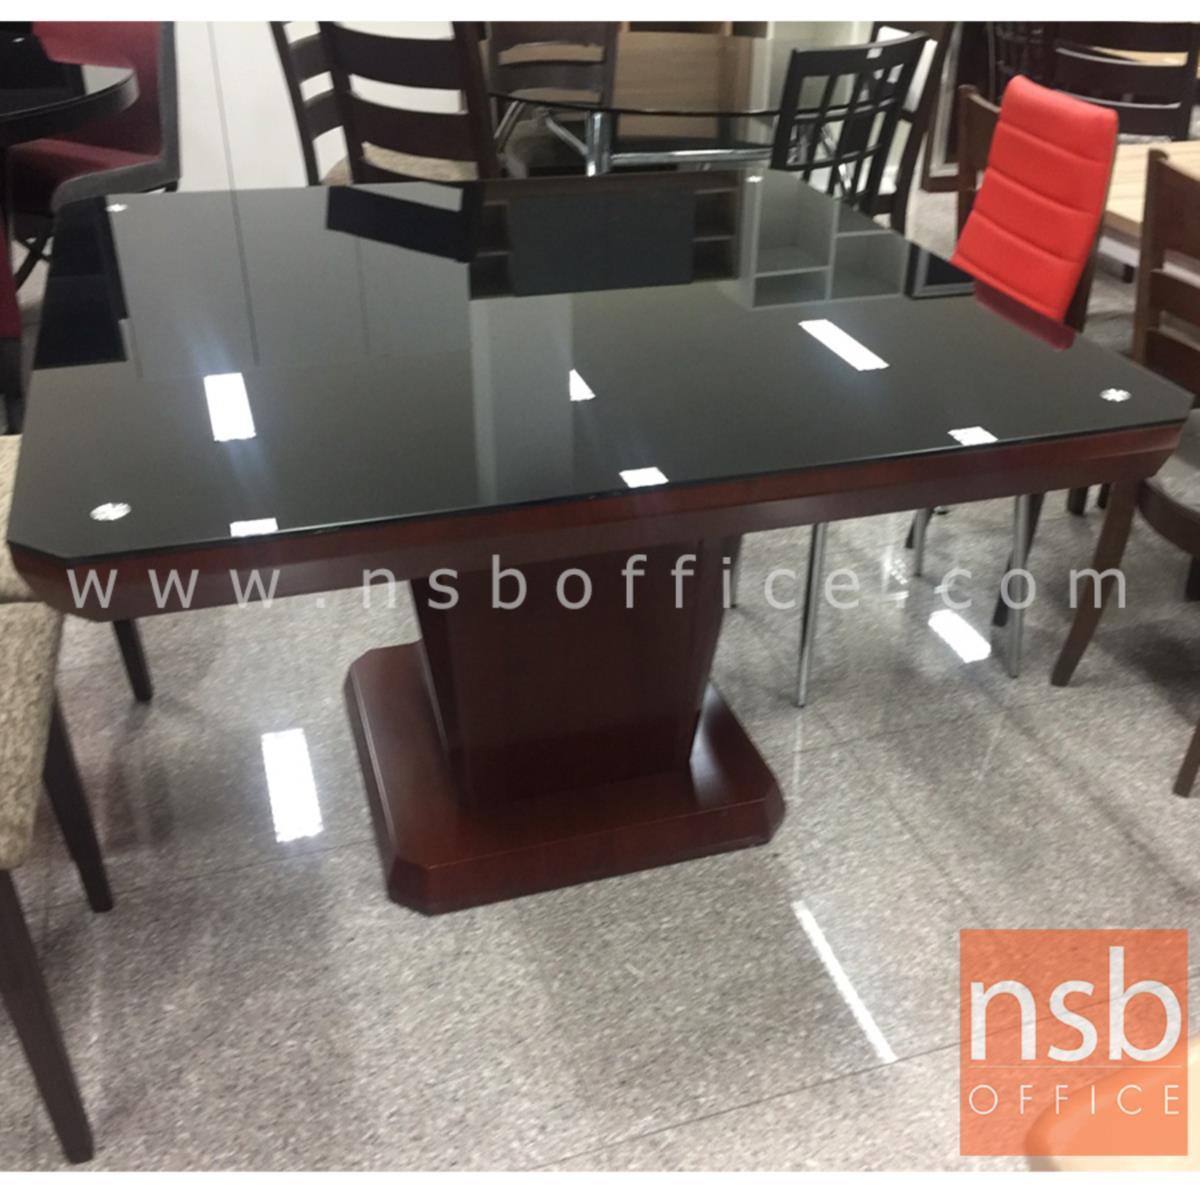 G14A185:โต๊ะรับประทานอาหารหน้ากระจก รุ่น Slater (สเลเทอร์)  โครงขาไม้